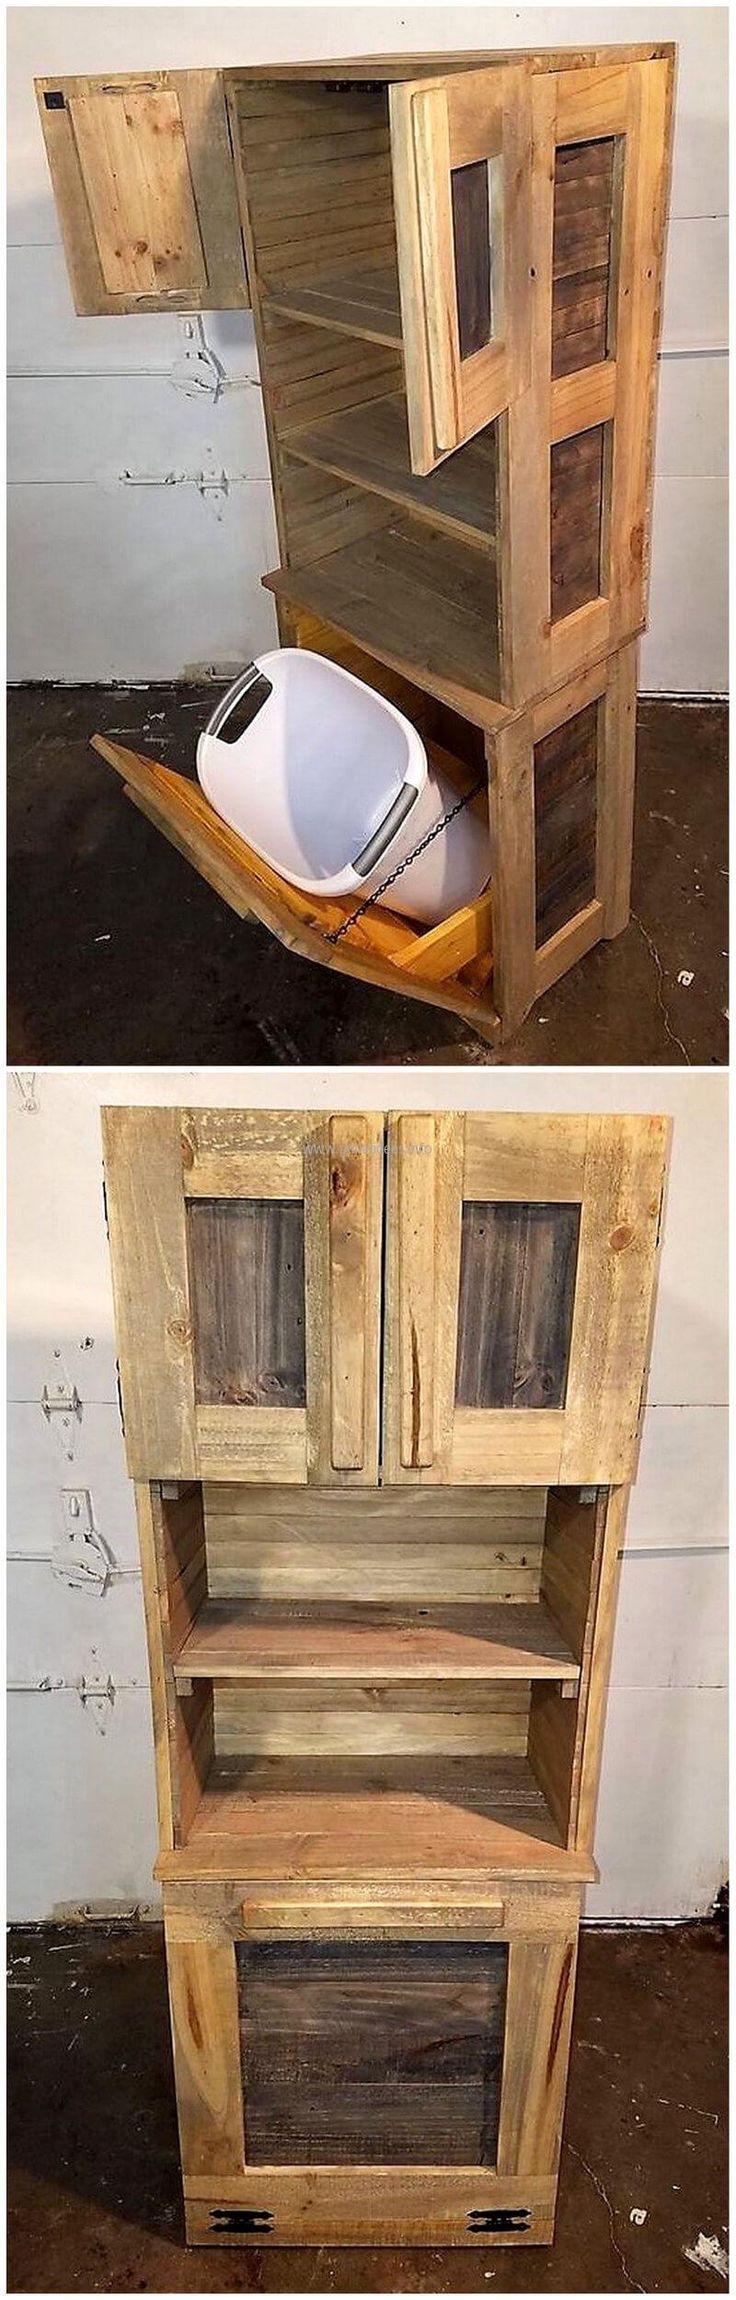 25 best ideas about trash bins on pinterest rustic - Diy tilt out hamper ...